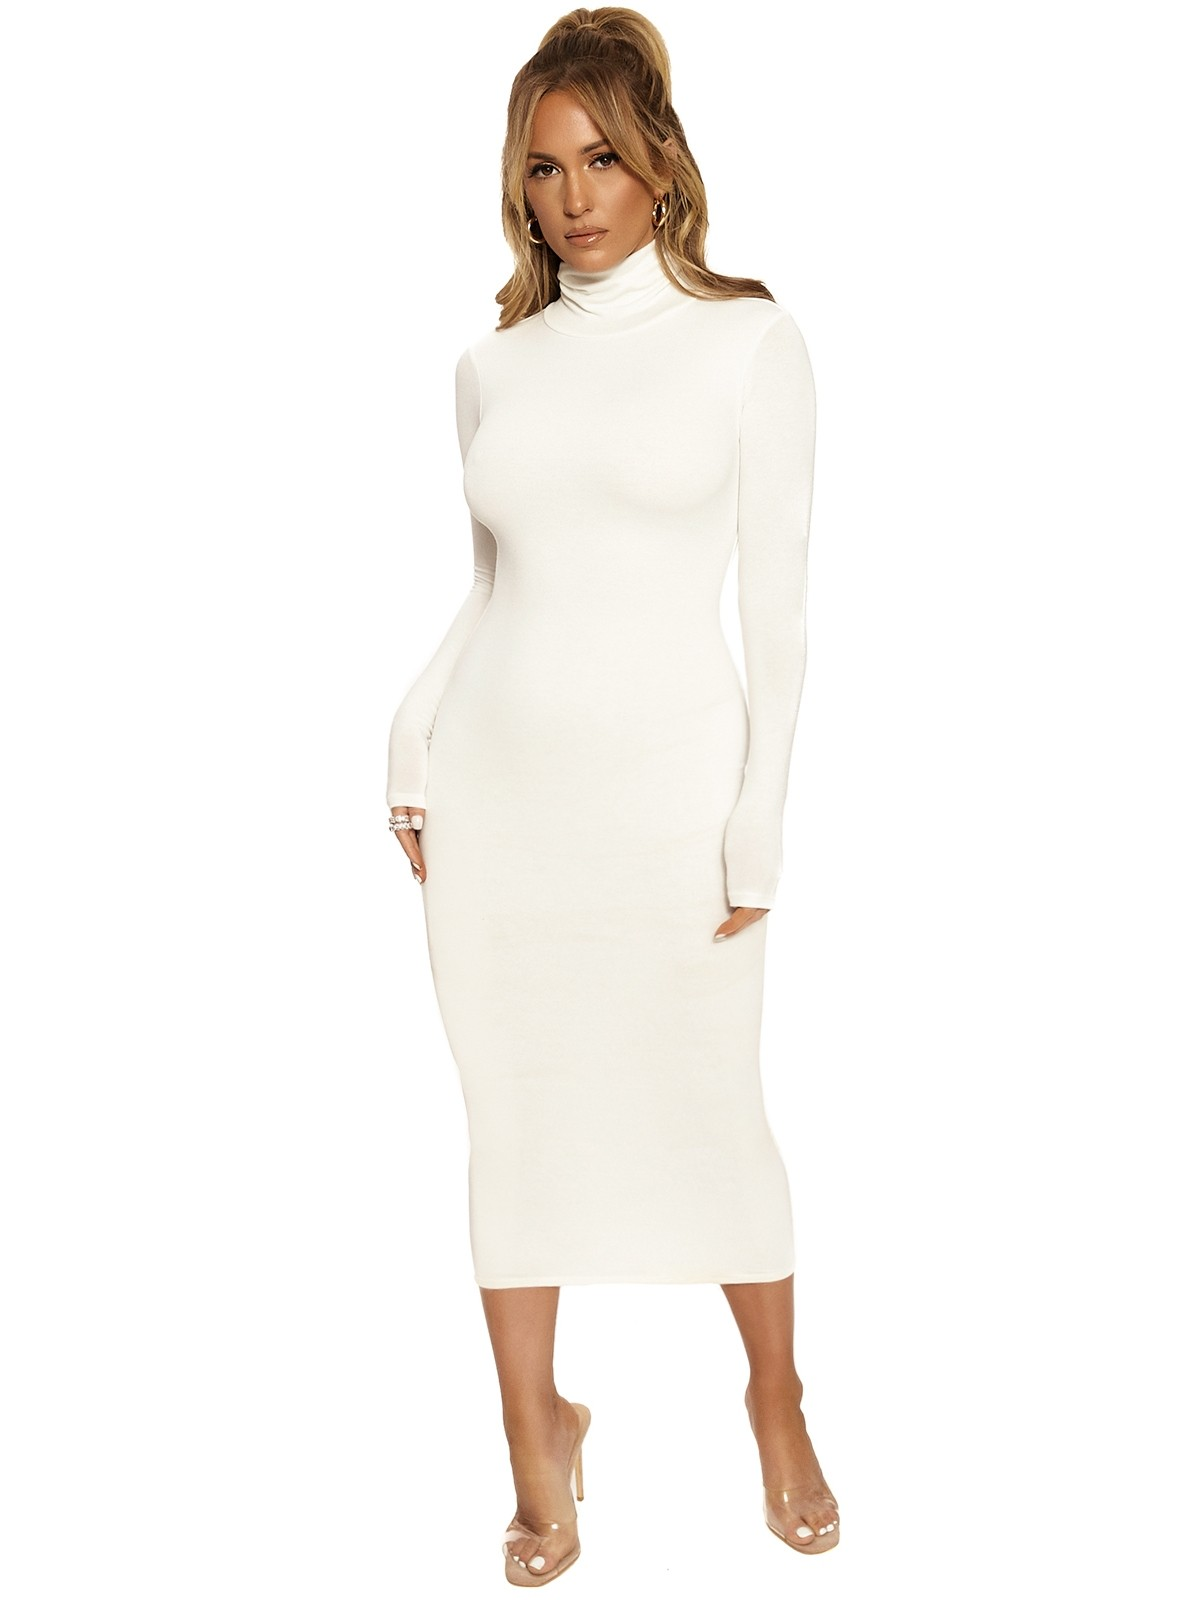 The NW Turtleneck Midi Dress by Naked Wardrobe, available on nakedwardrobe.com for $48 Kylie Jenner Dress SIMILAR PRODUCT